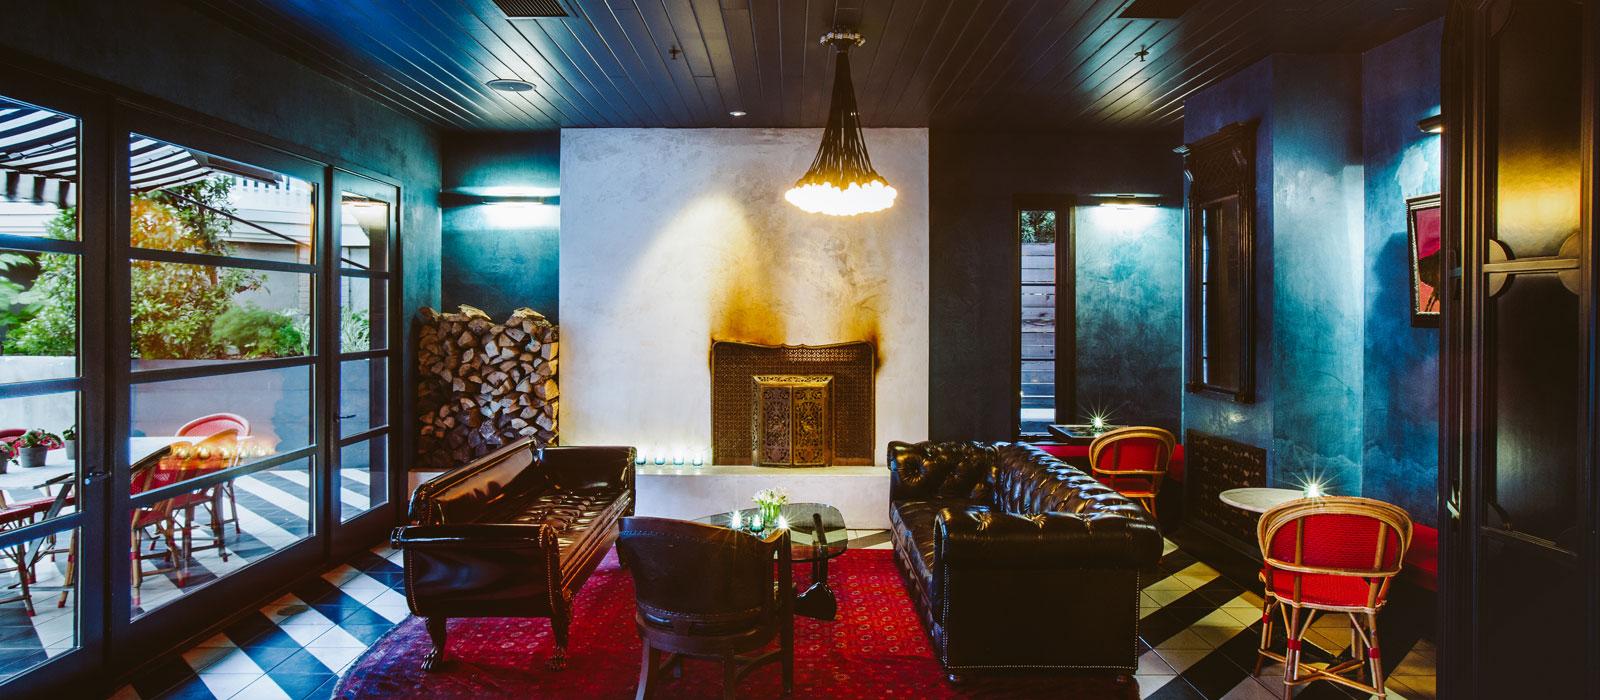 4 Hotel Saint Cecilia Austin Texas loungfe and bar interior design vintage apartment ciekawe wnetrza hotelowe styl amerykanski